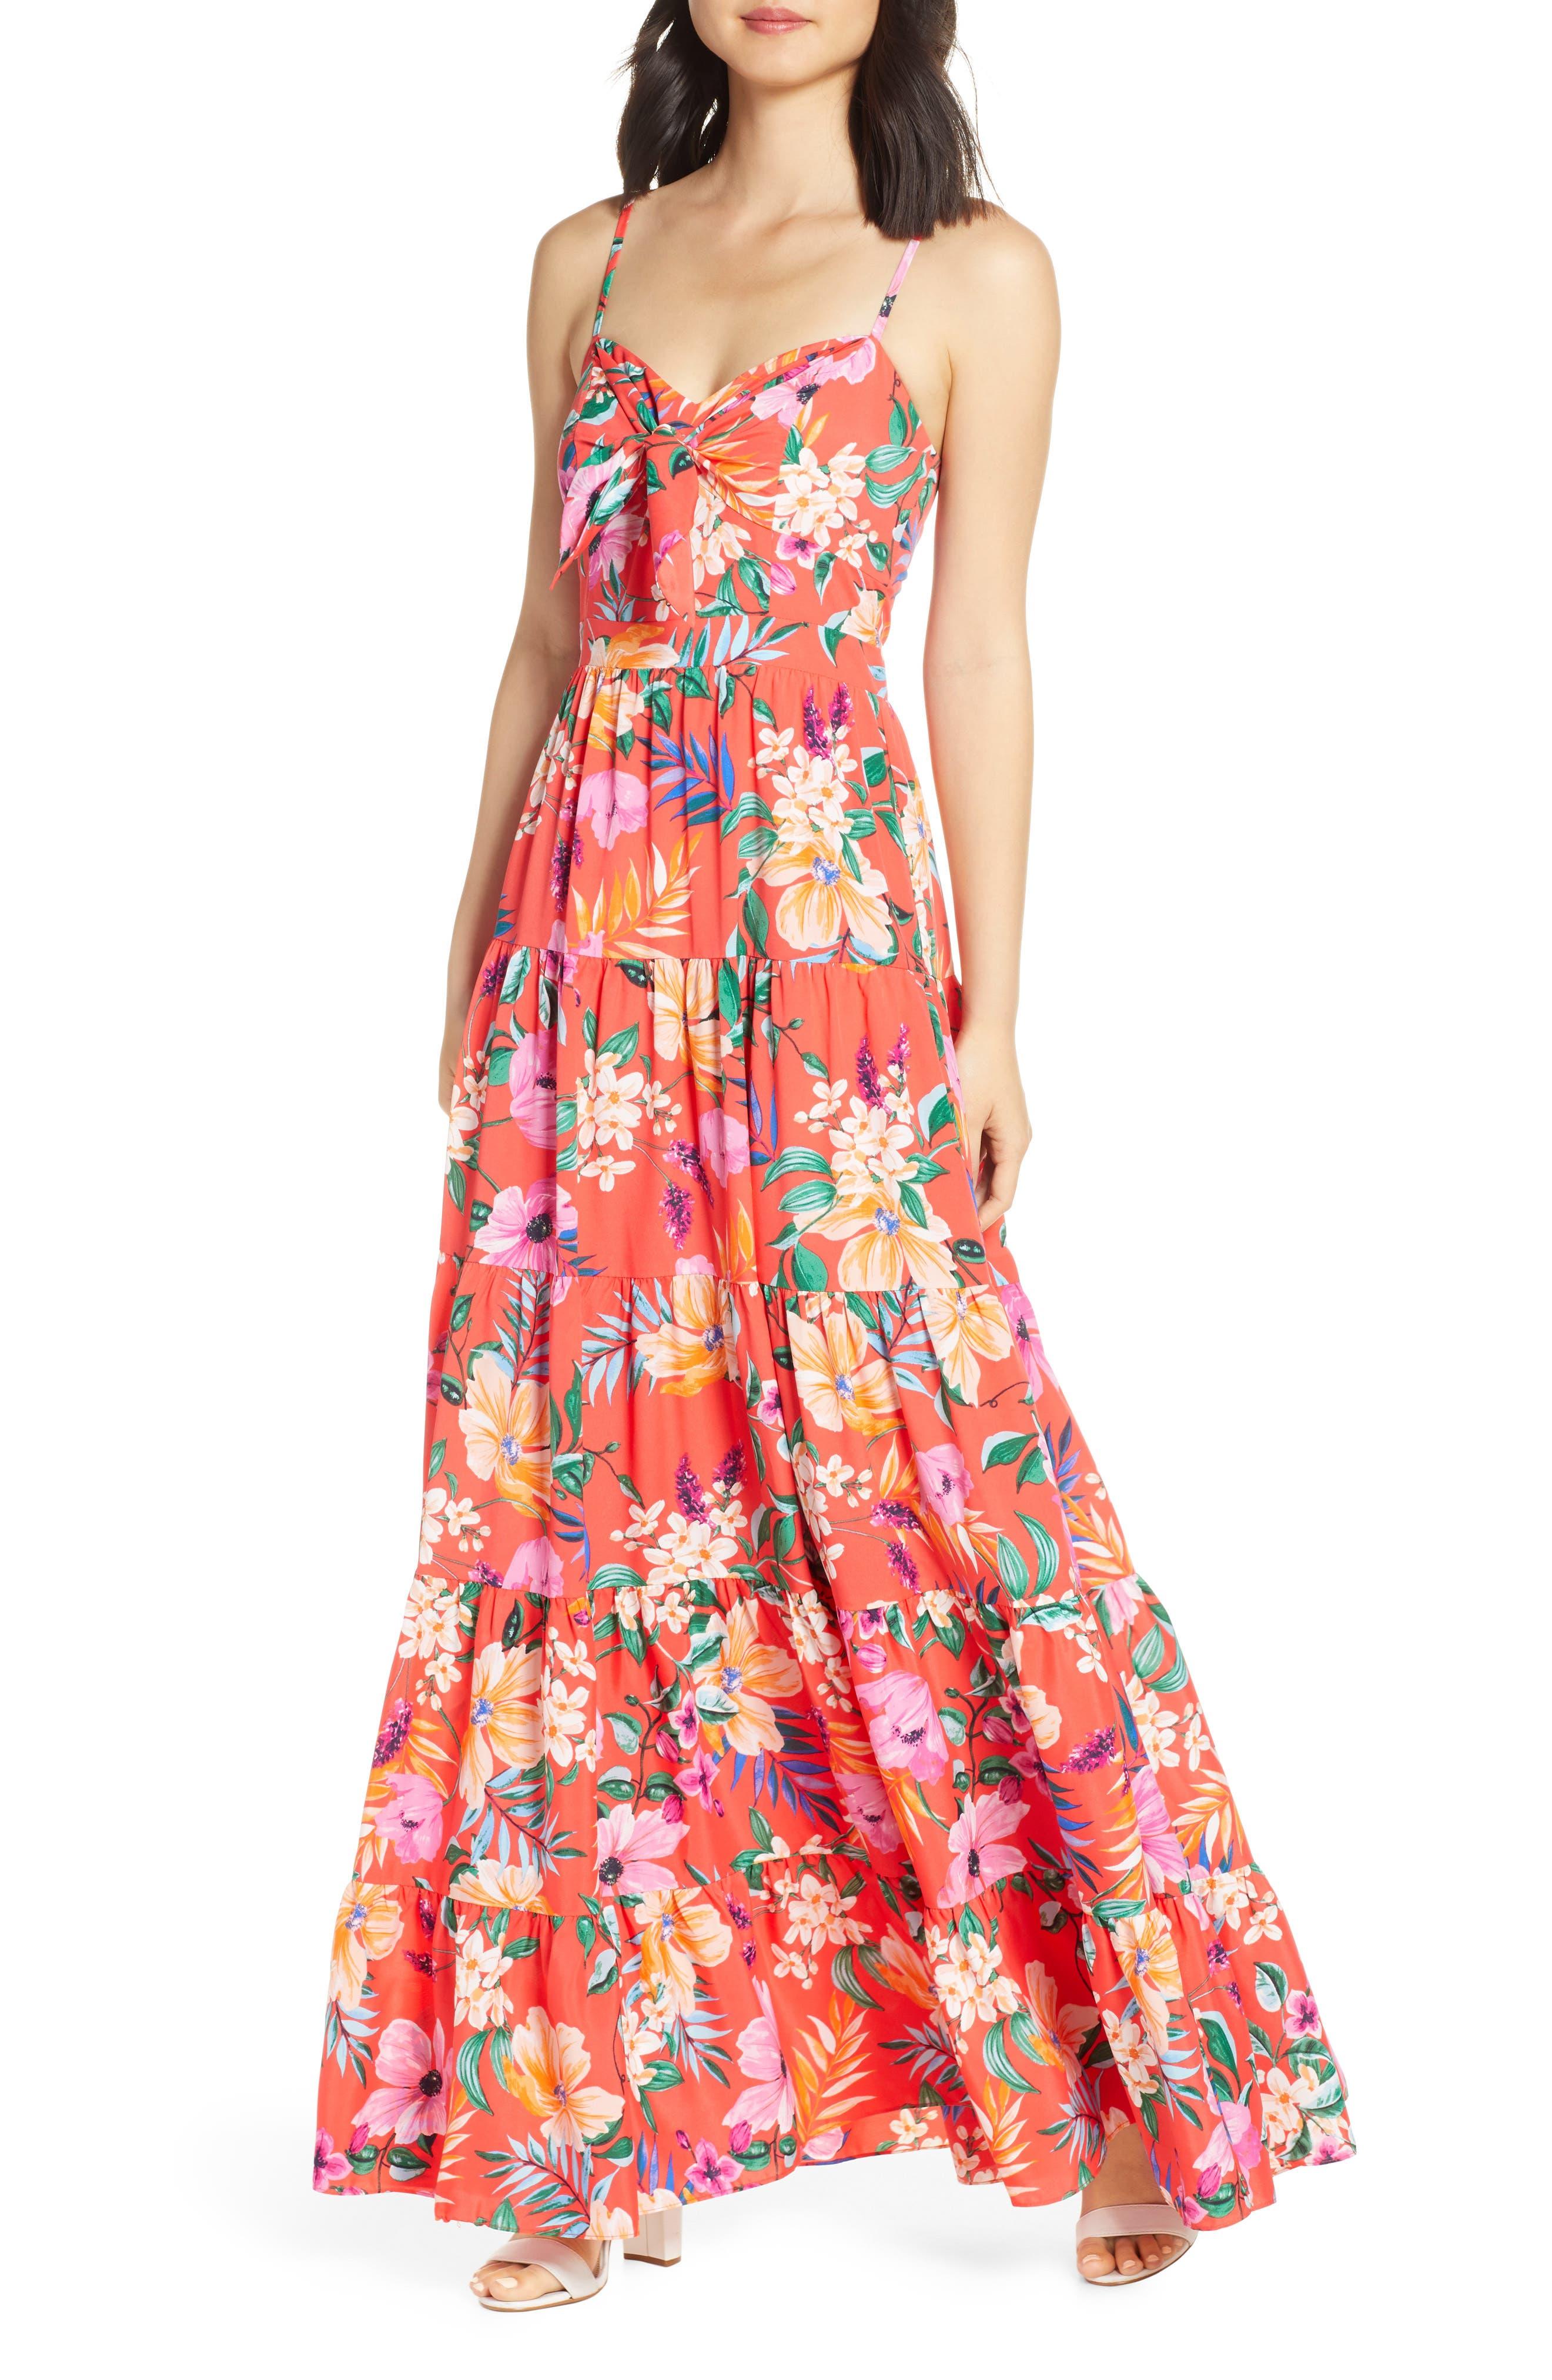 Eliza J Floral Tie Front Tiered Maxi Sundress, Orange